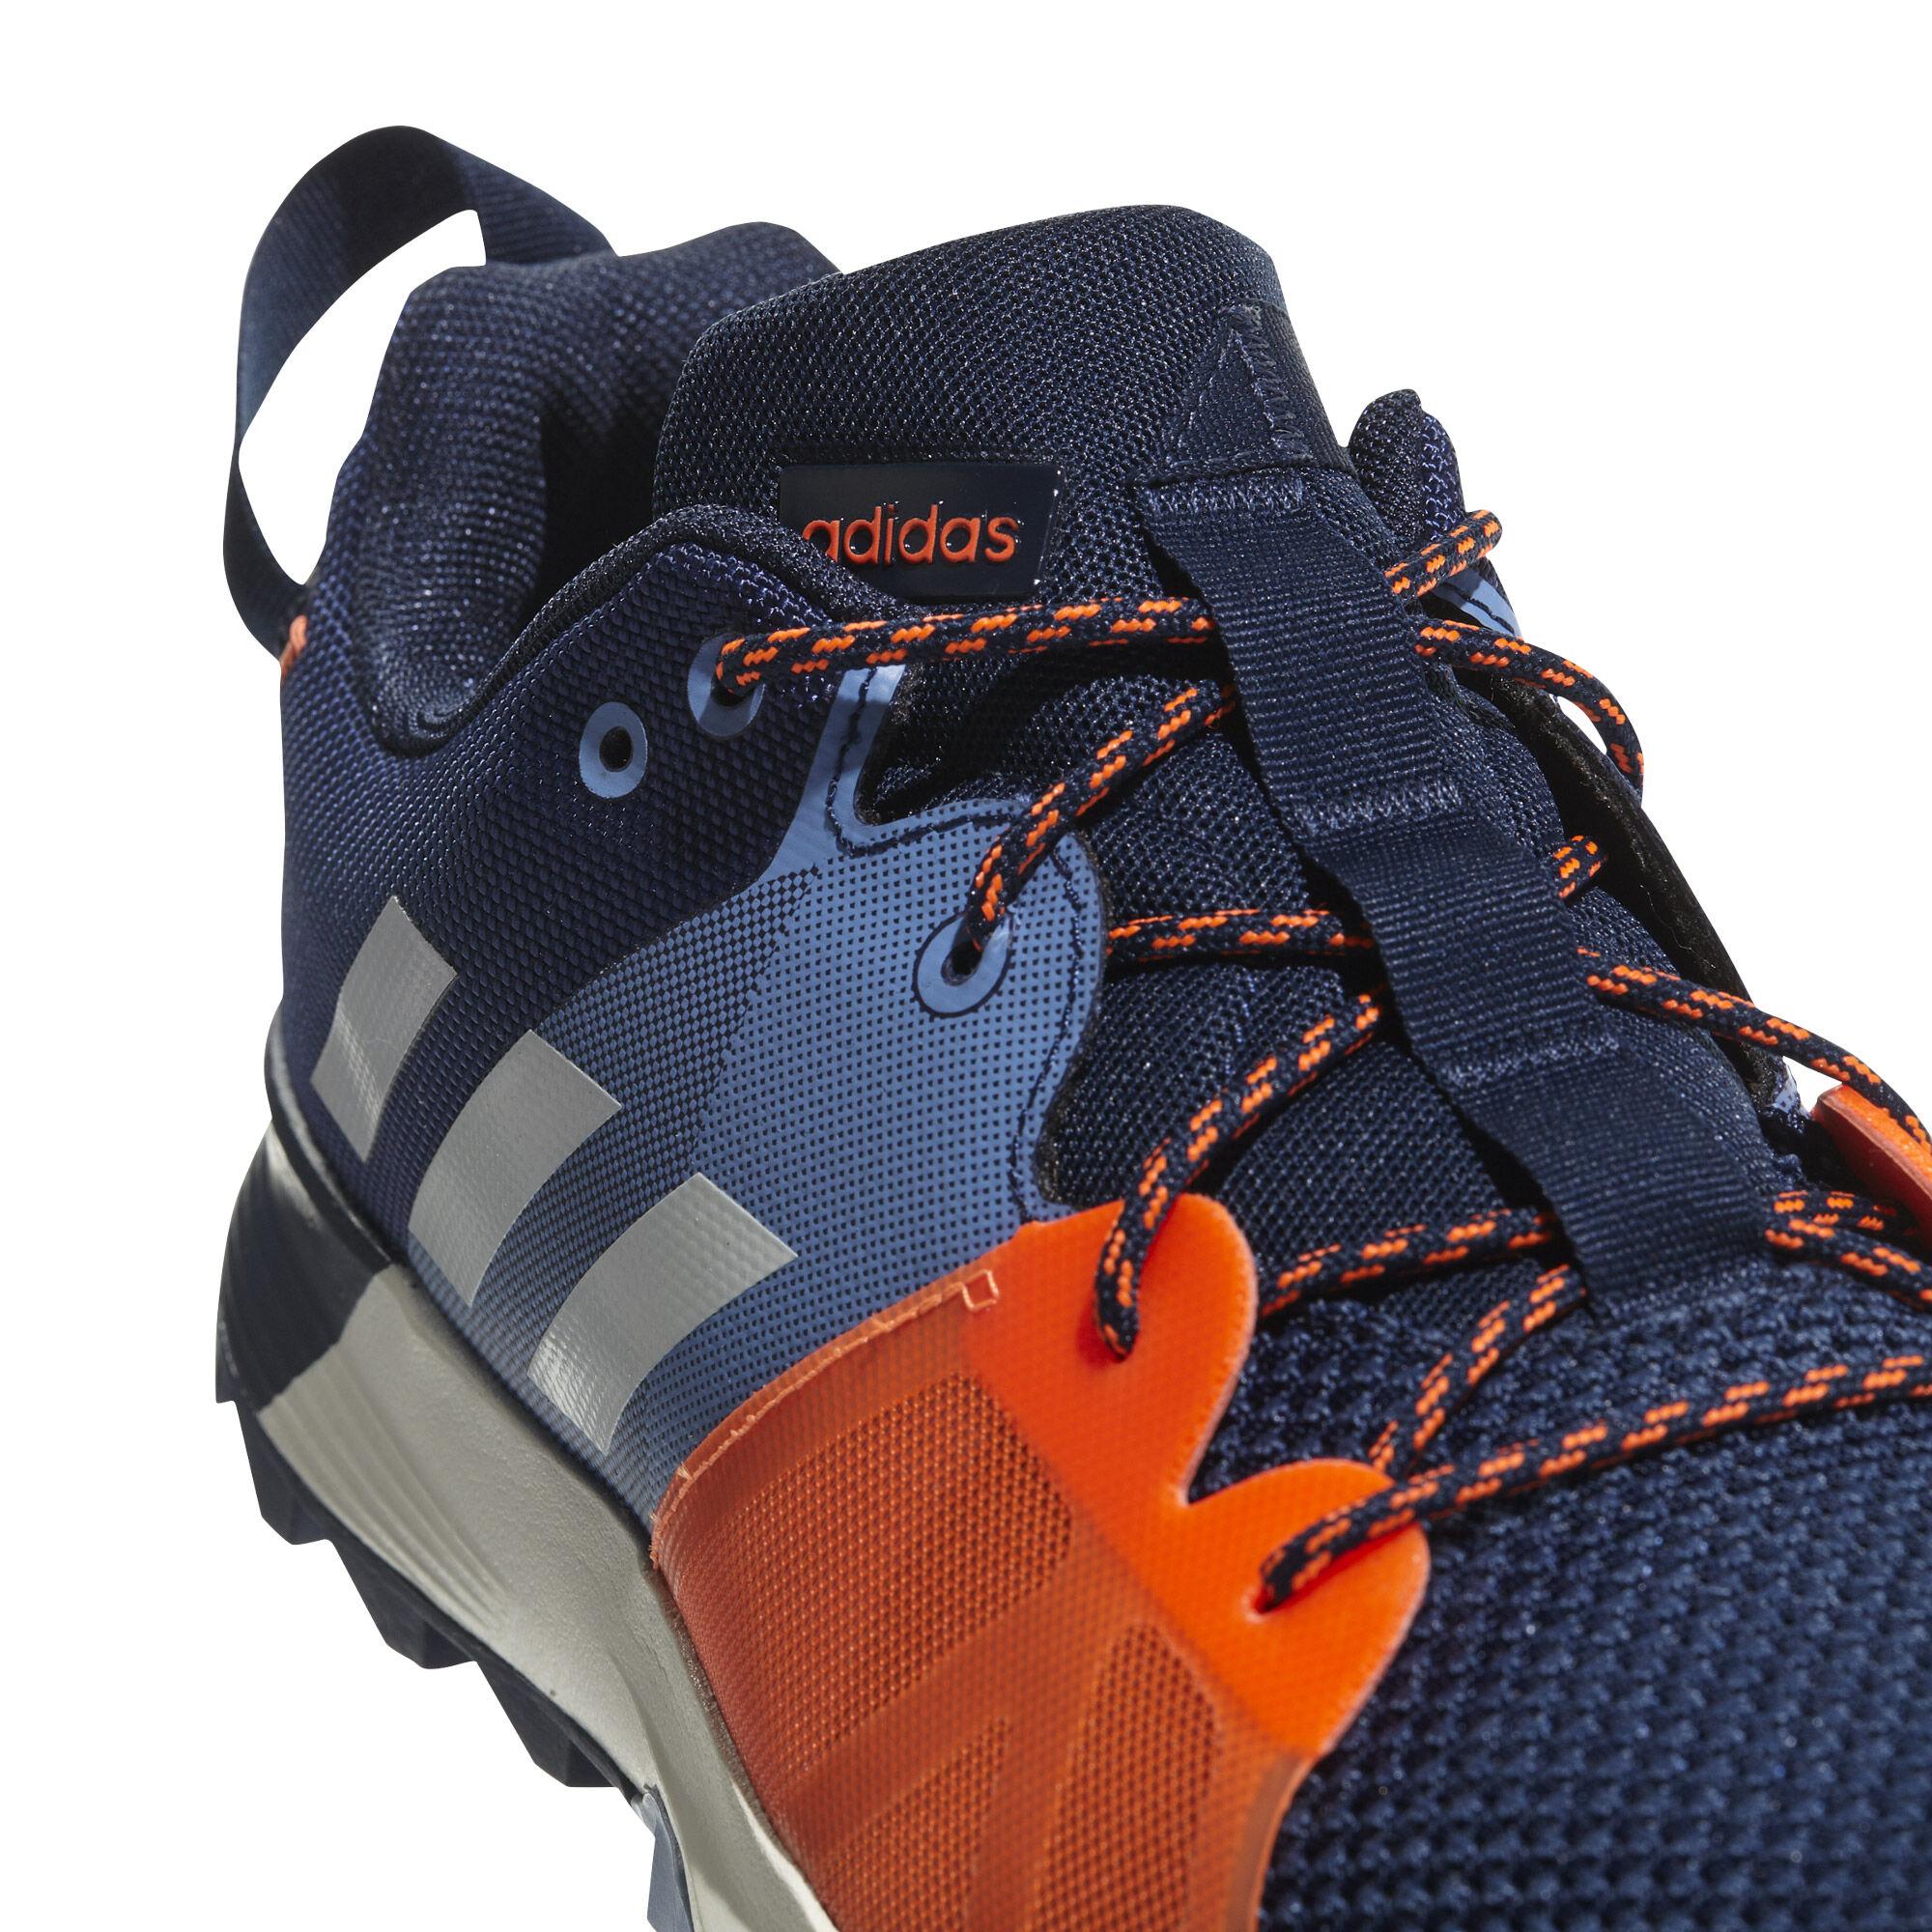 adidas Kanadia 8.1 TR Trailschuh Herren Schwarz, Grau